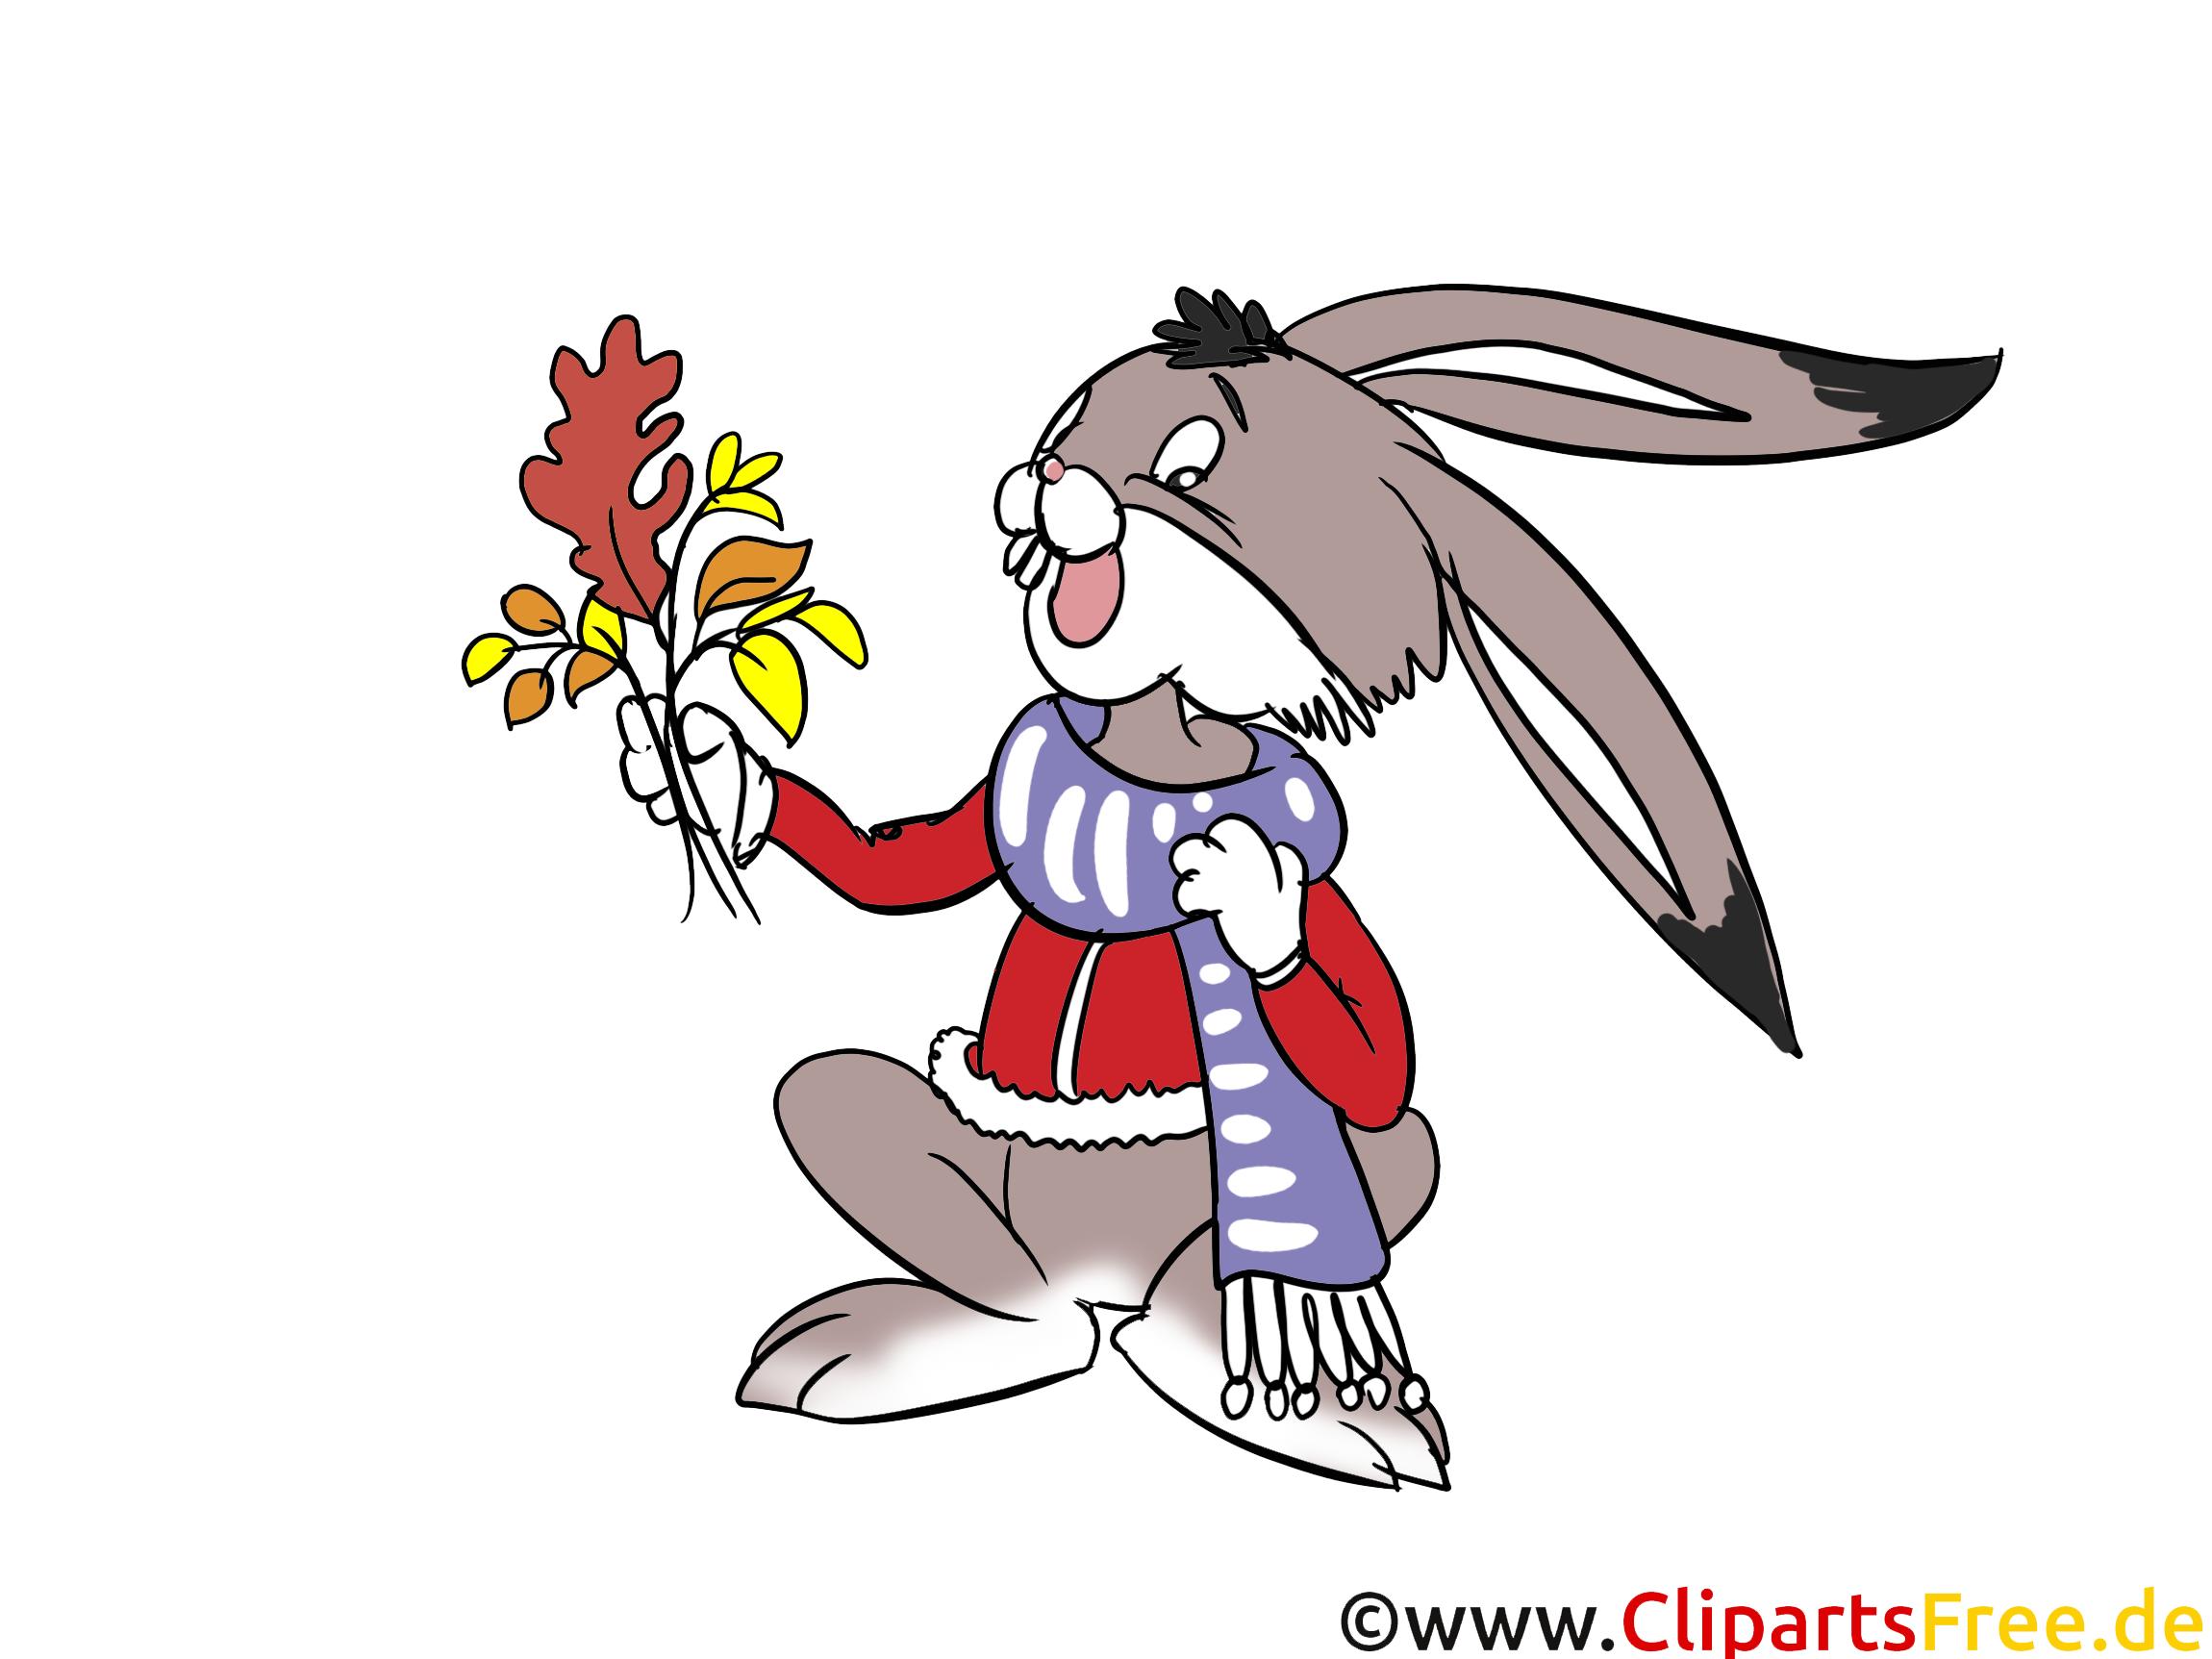 Lustiger Hase, Kaninachen Clipart, Cartoon, Comic, Illustration